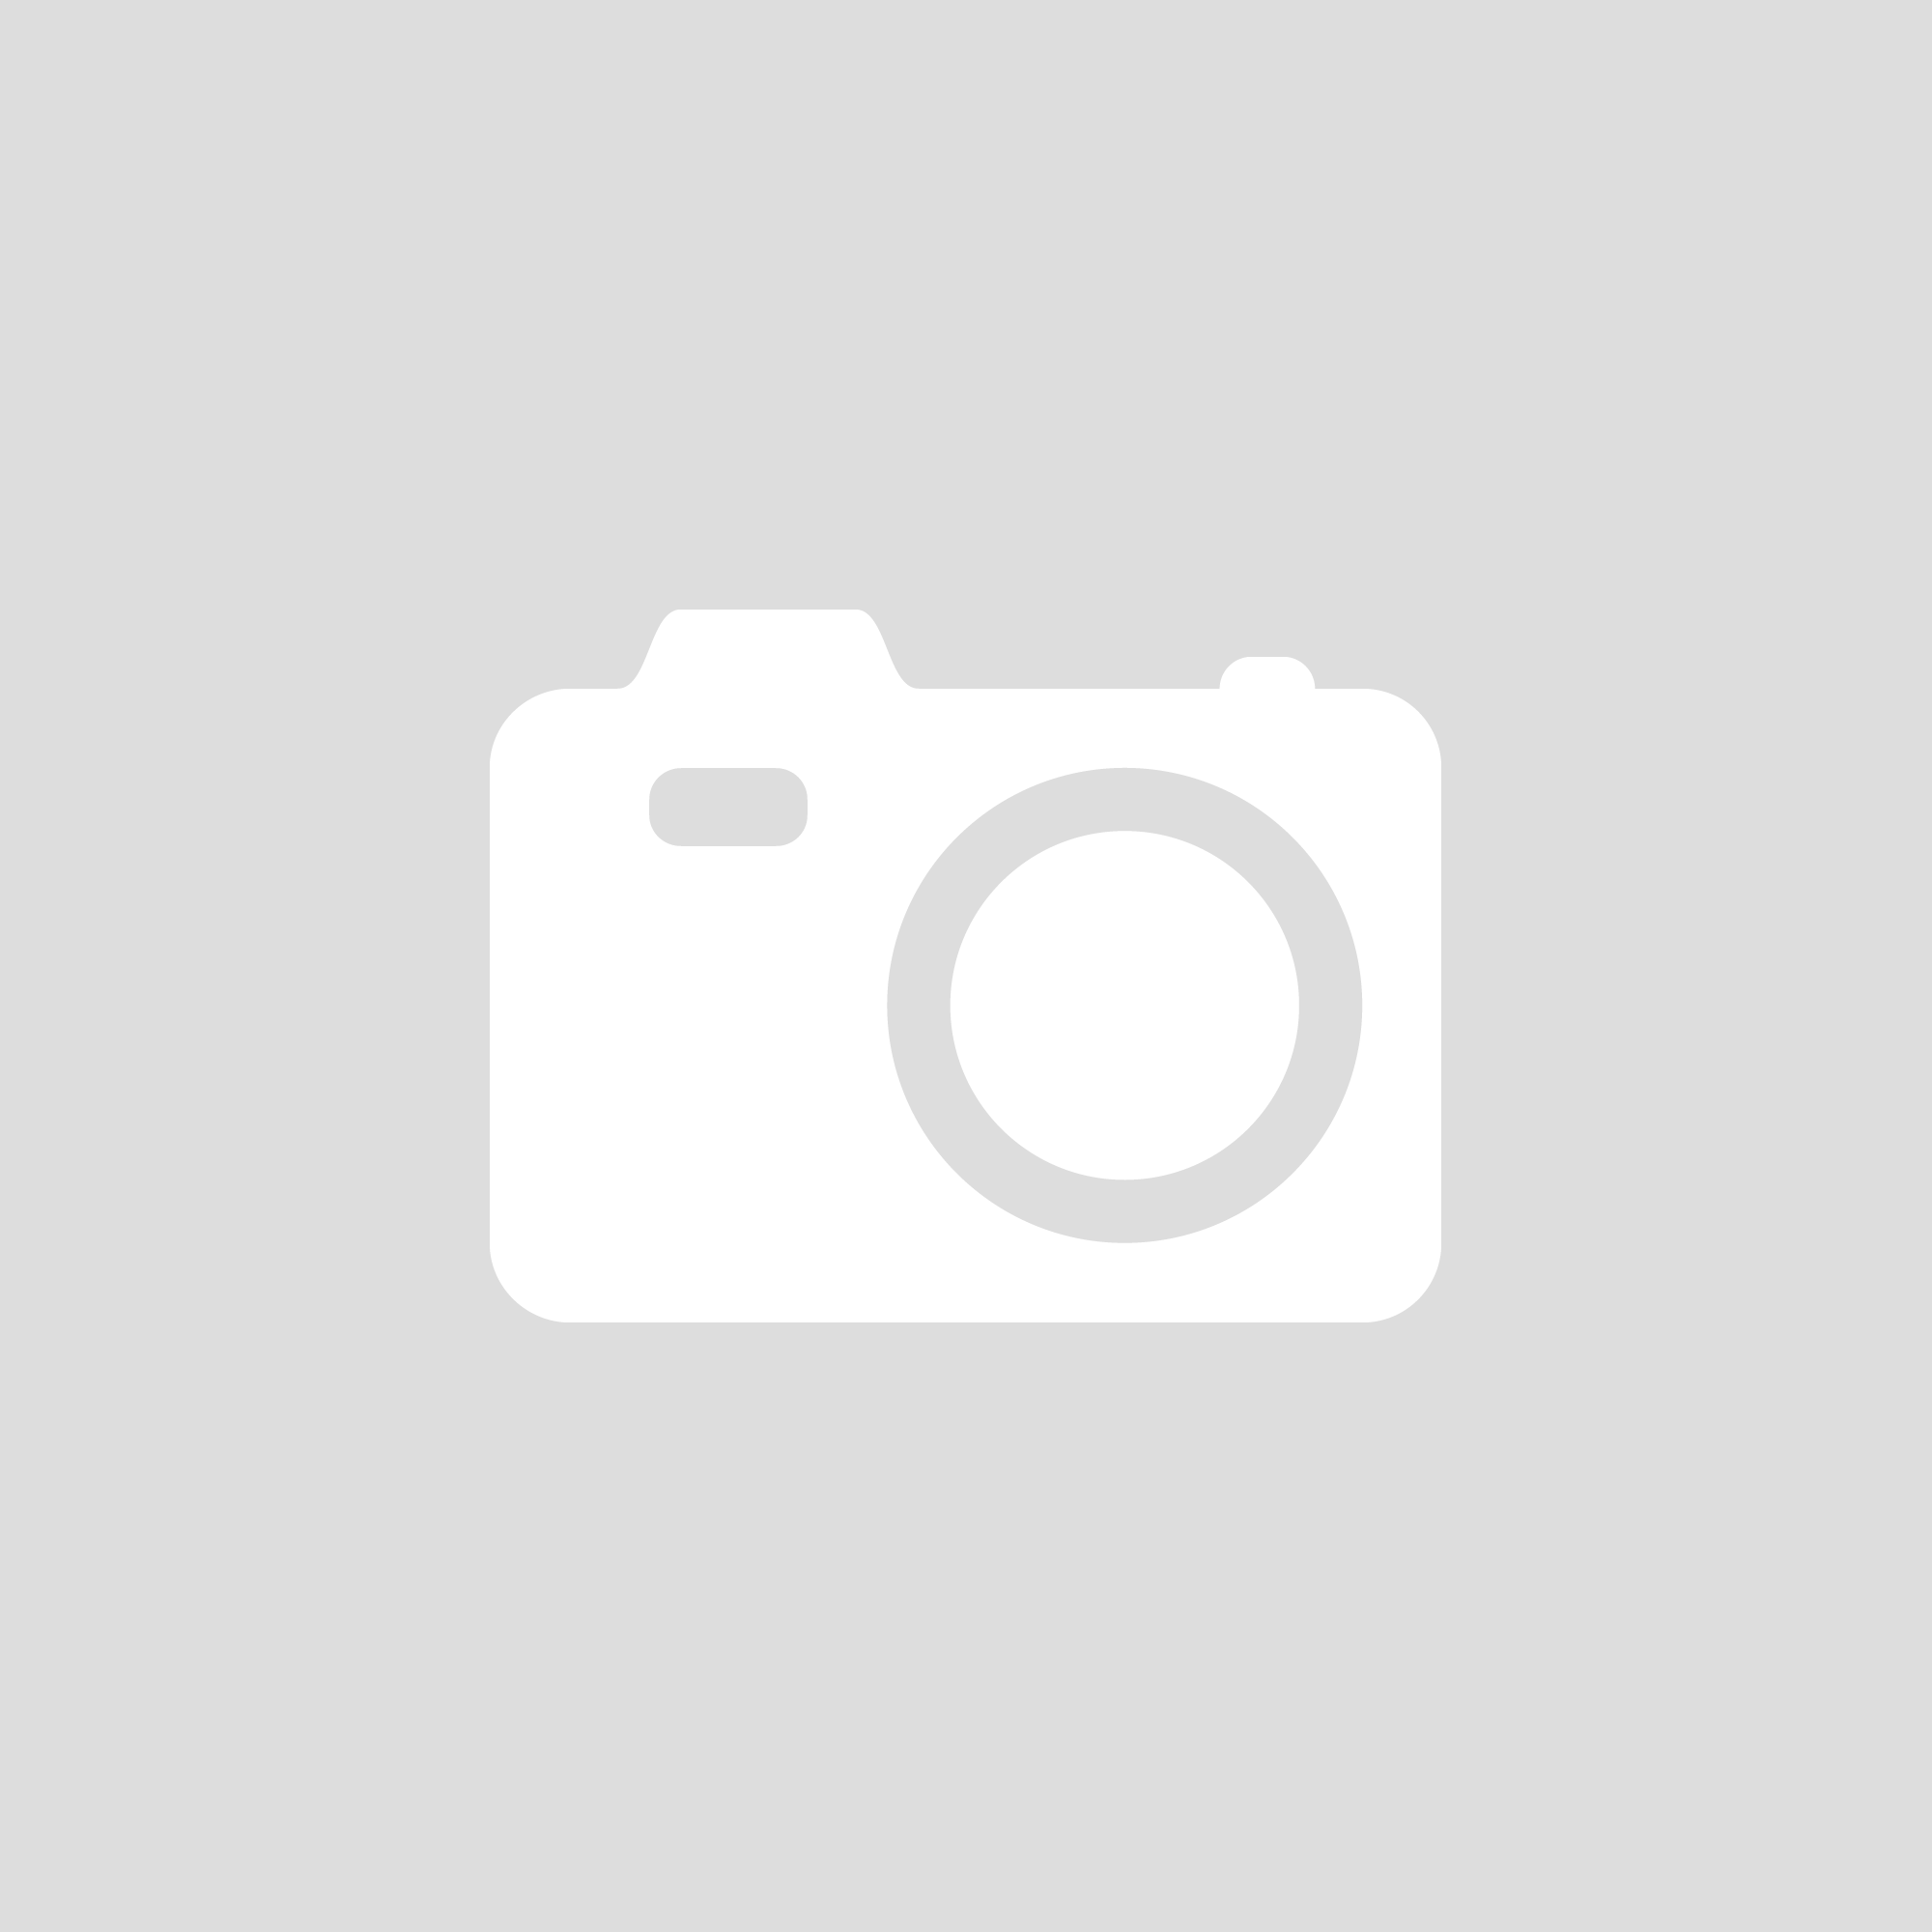 Leah Pendant Blush by Lightmode LMB207